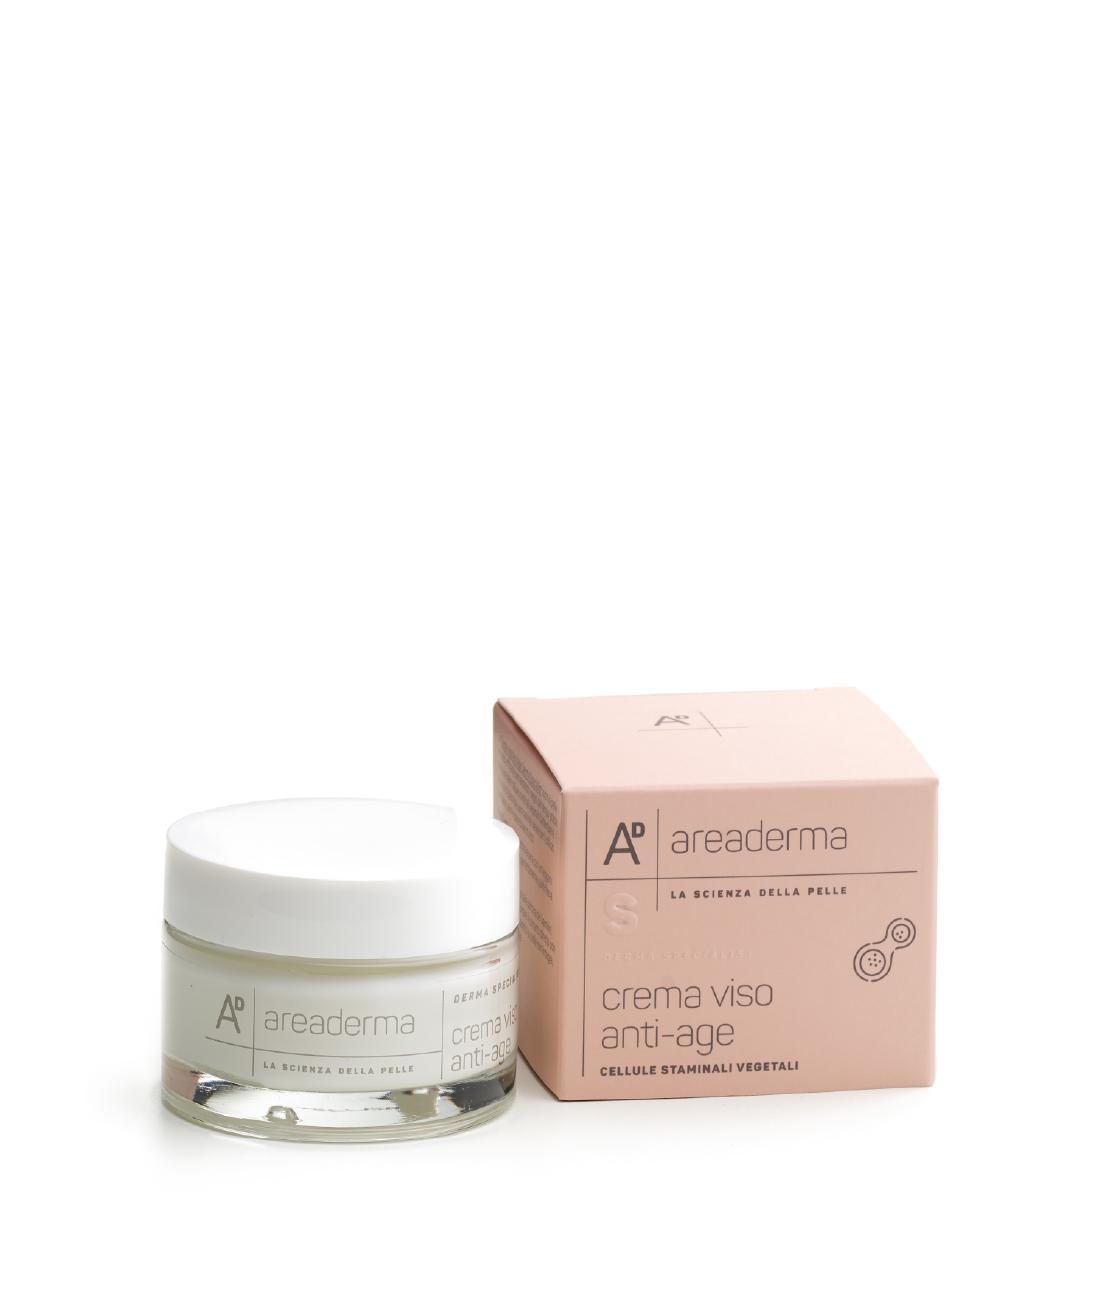 Crema viso anti-age cellule staminali vegetali